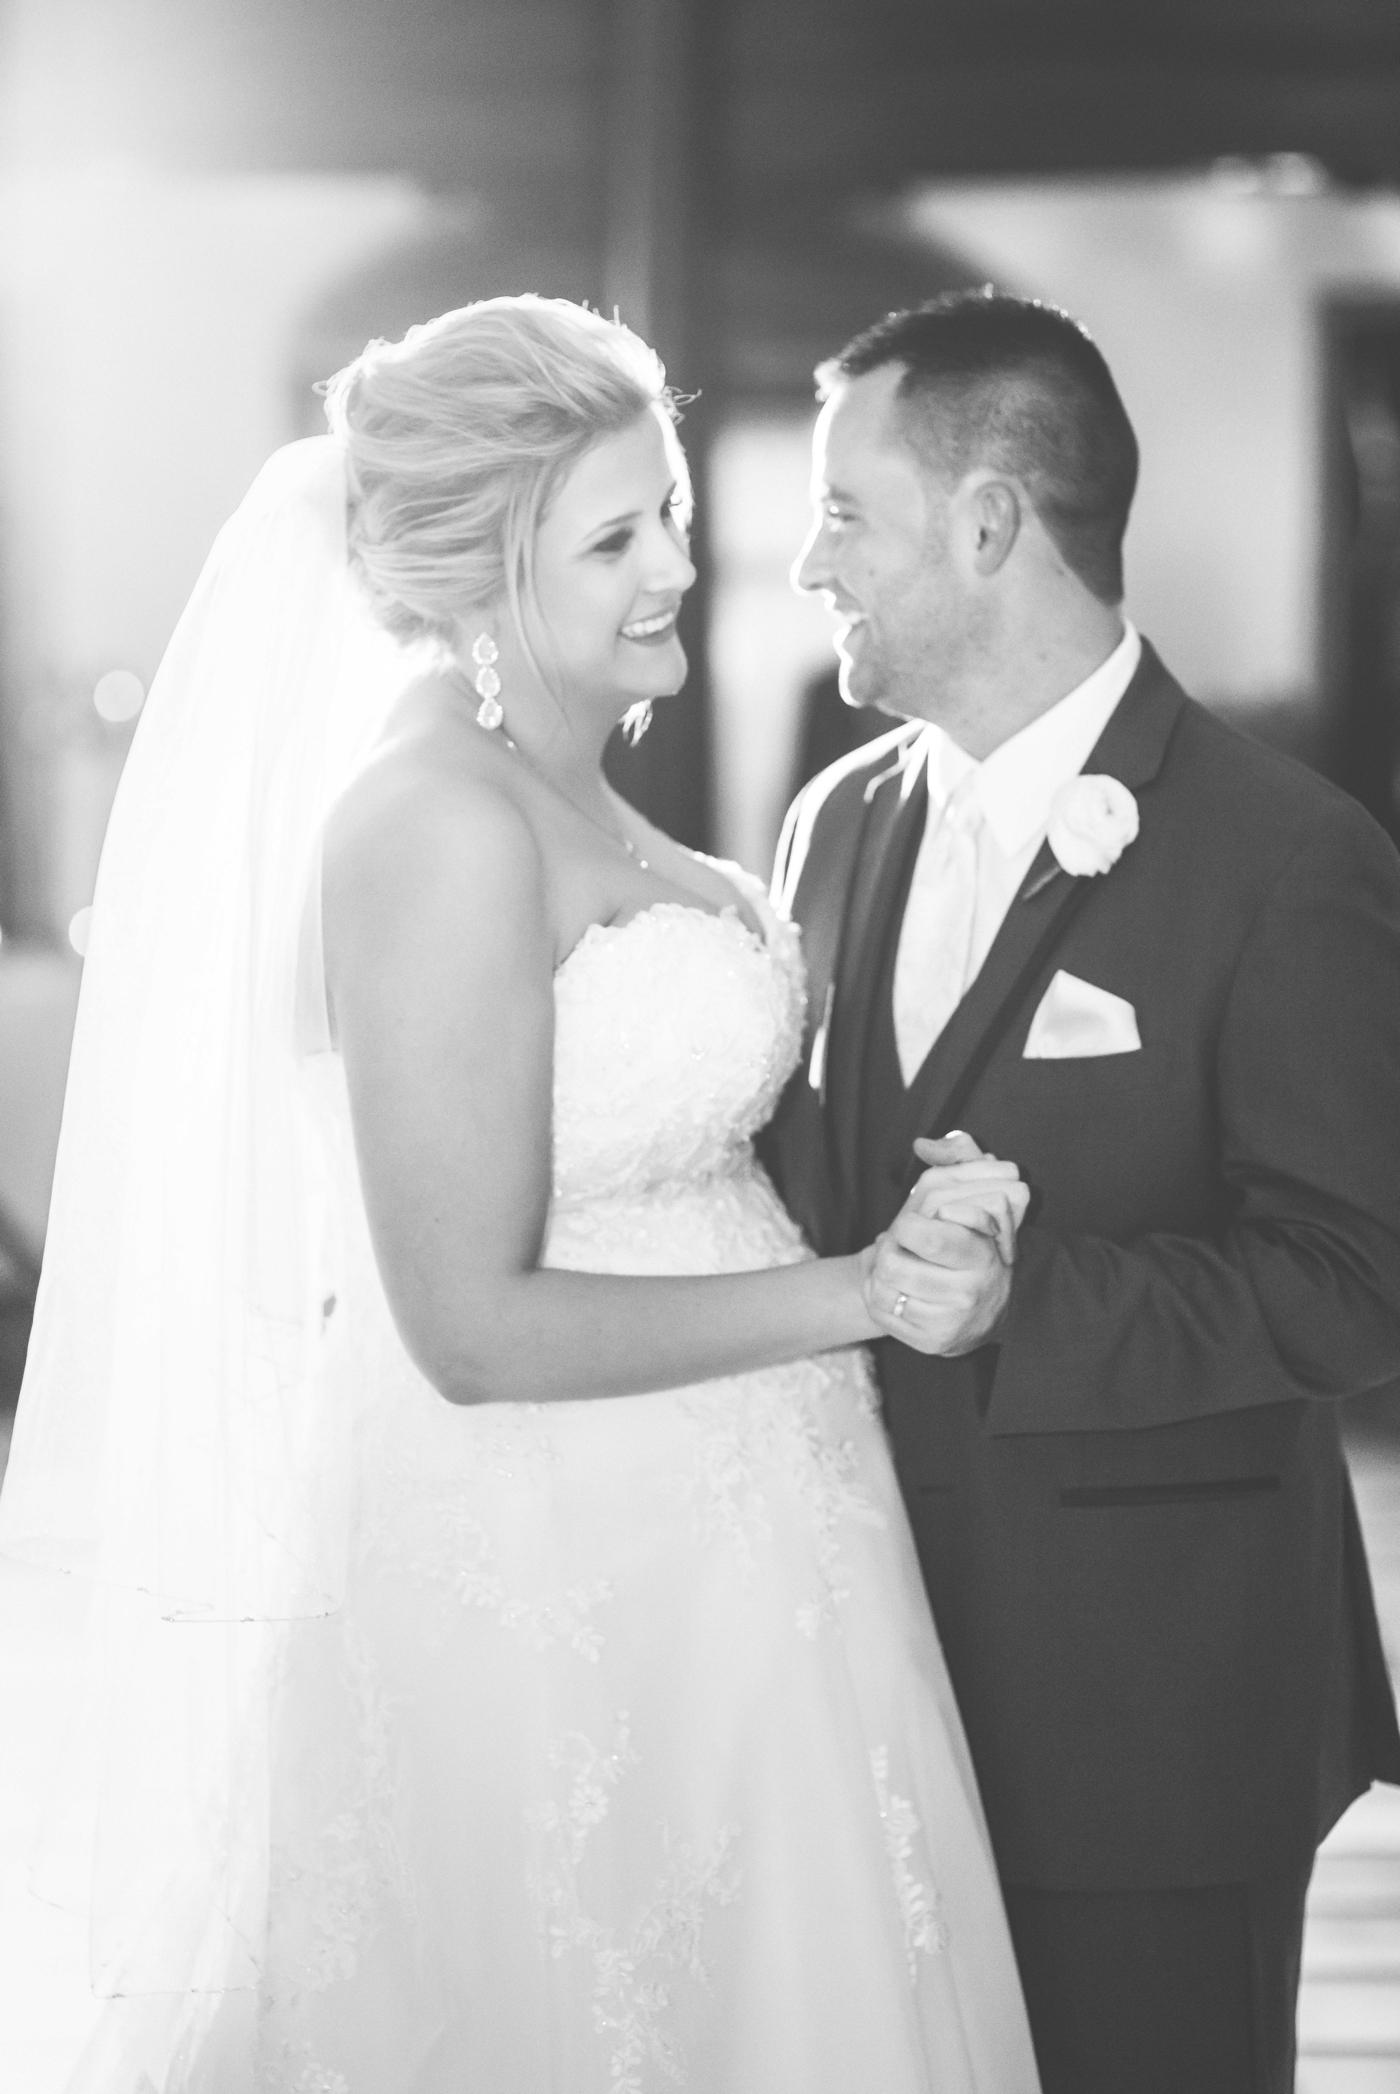 chicago-fine-art-wedding-photography-cassady20